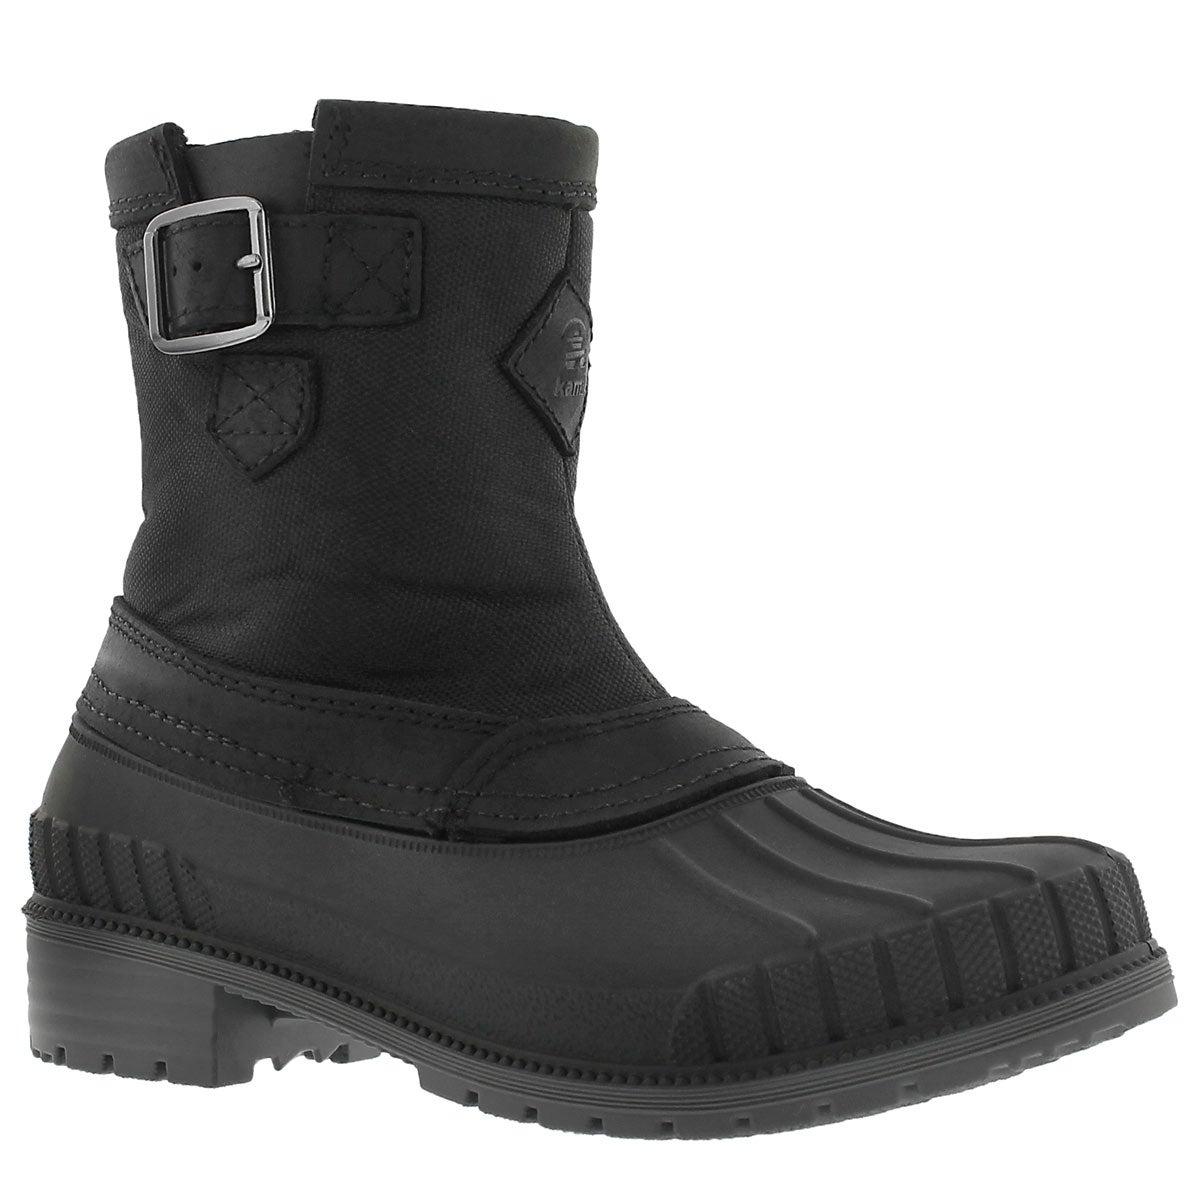 Lds Avelle blk waterproof winter boot